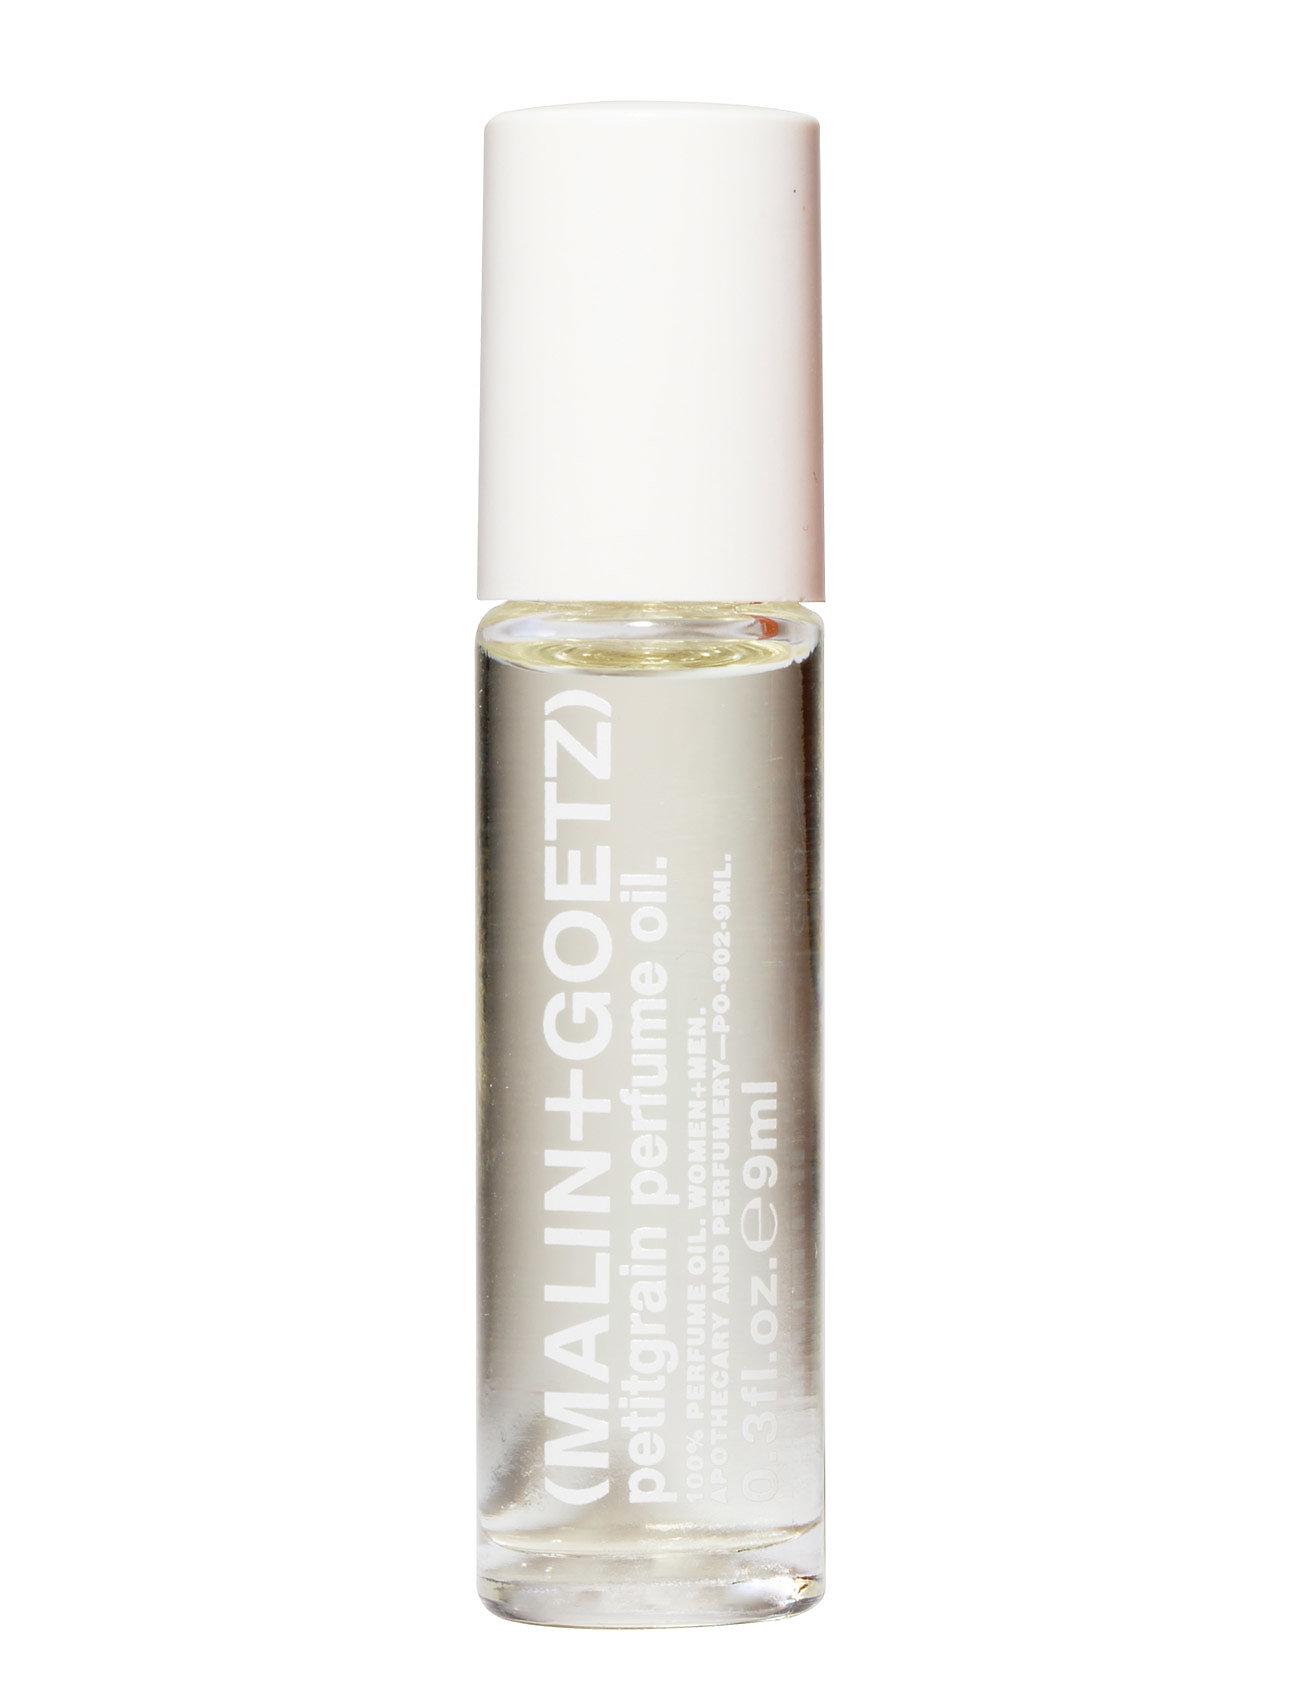 malin+goetz Petitgrain perfume oil på boozt.com dk